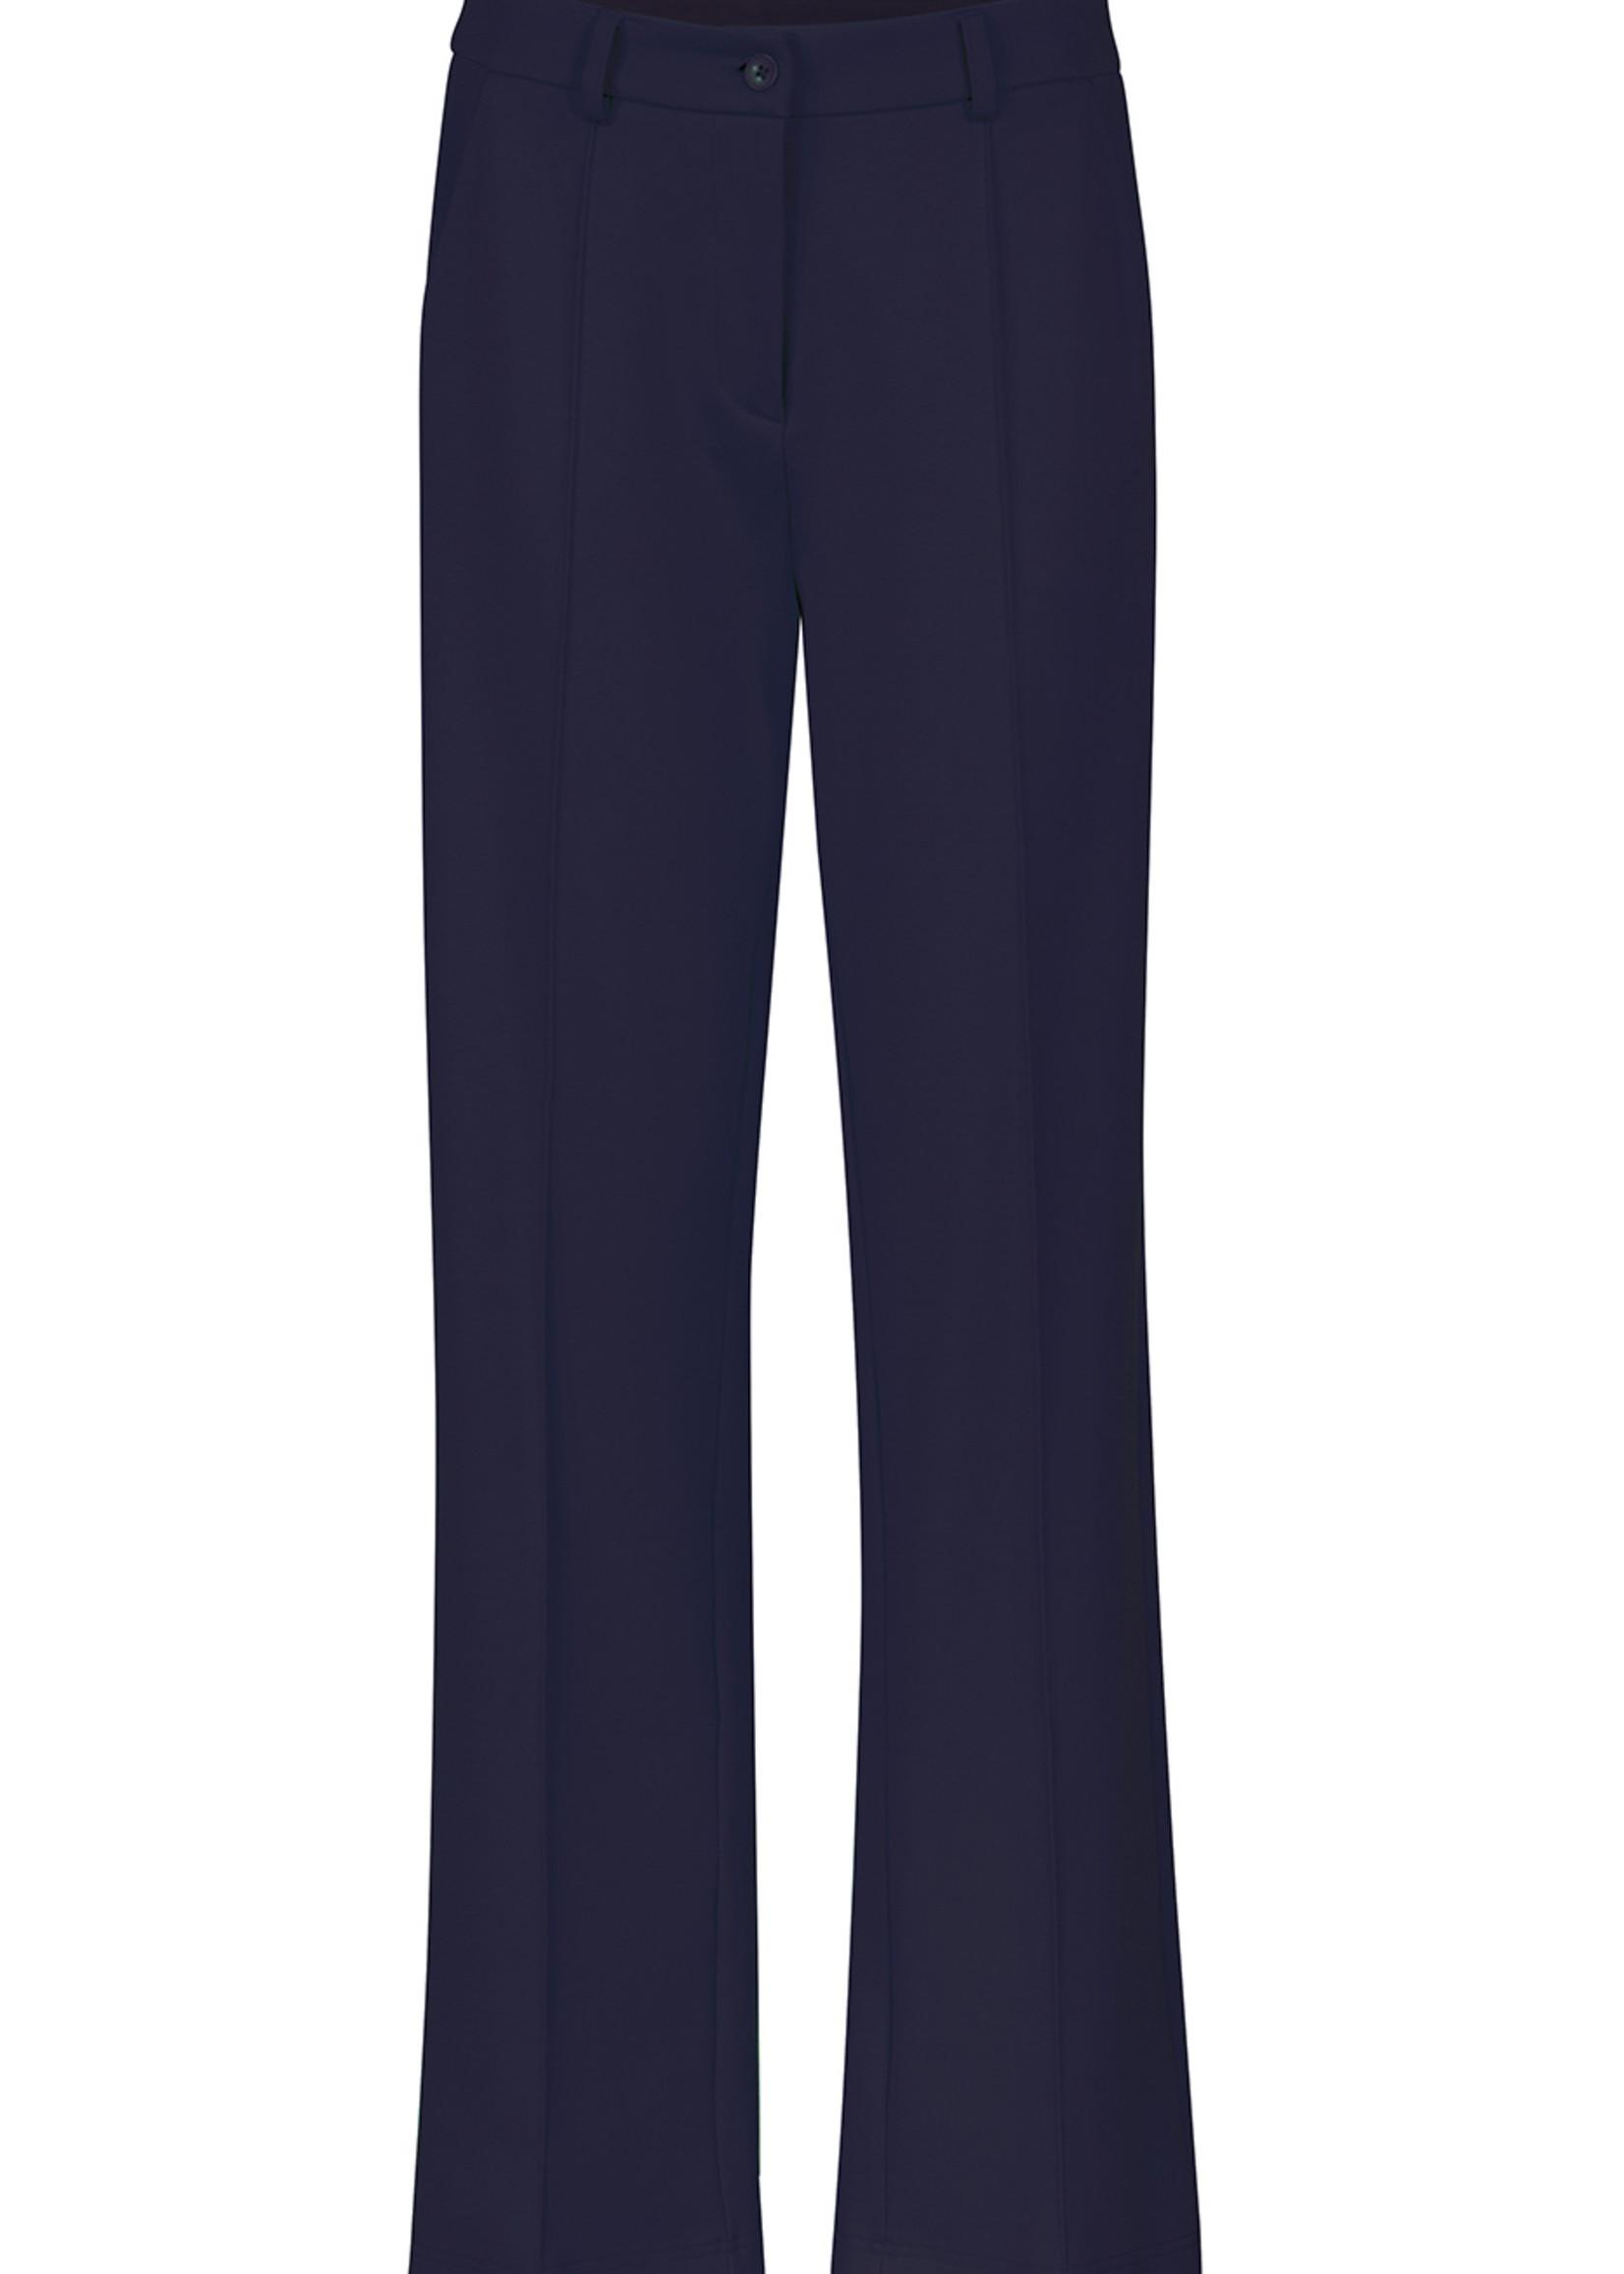 Zilch Zilch Navy Straight Leg Pants